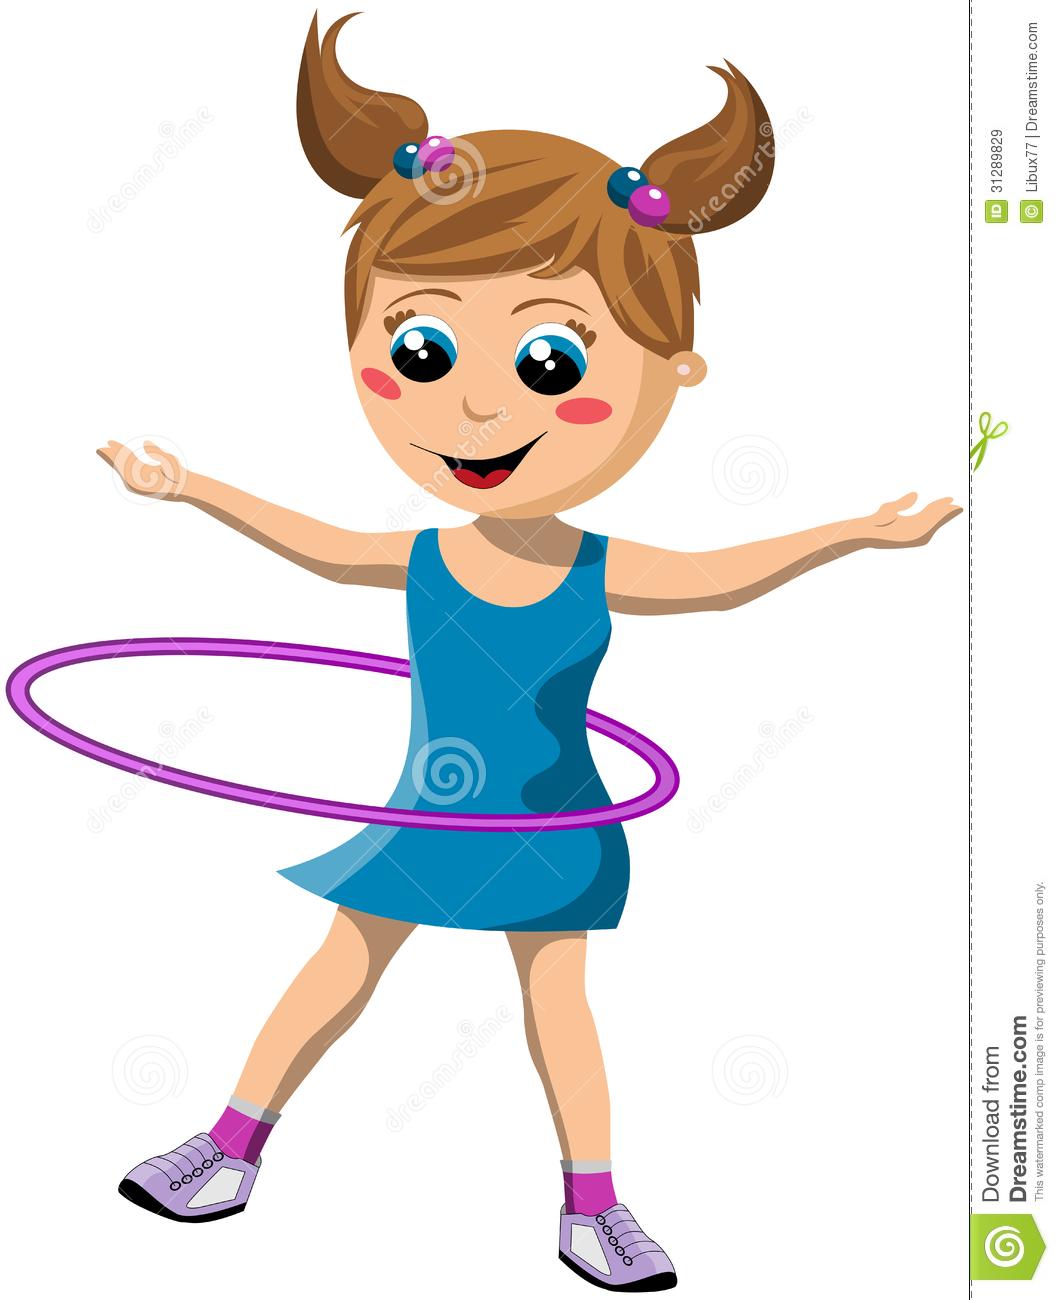 Kids twirling clipart.